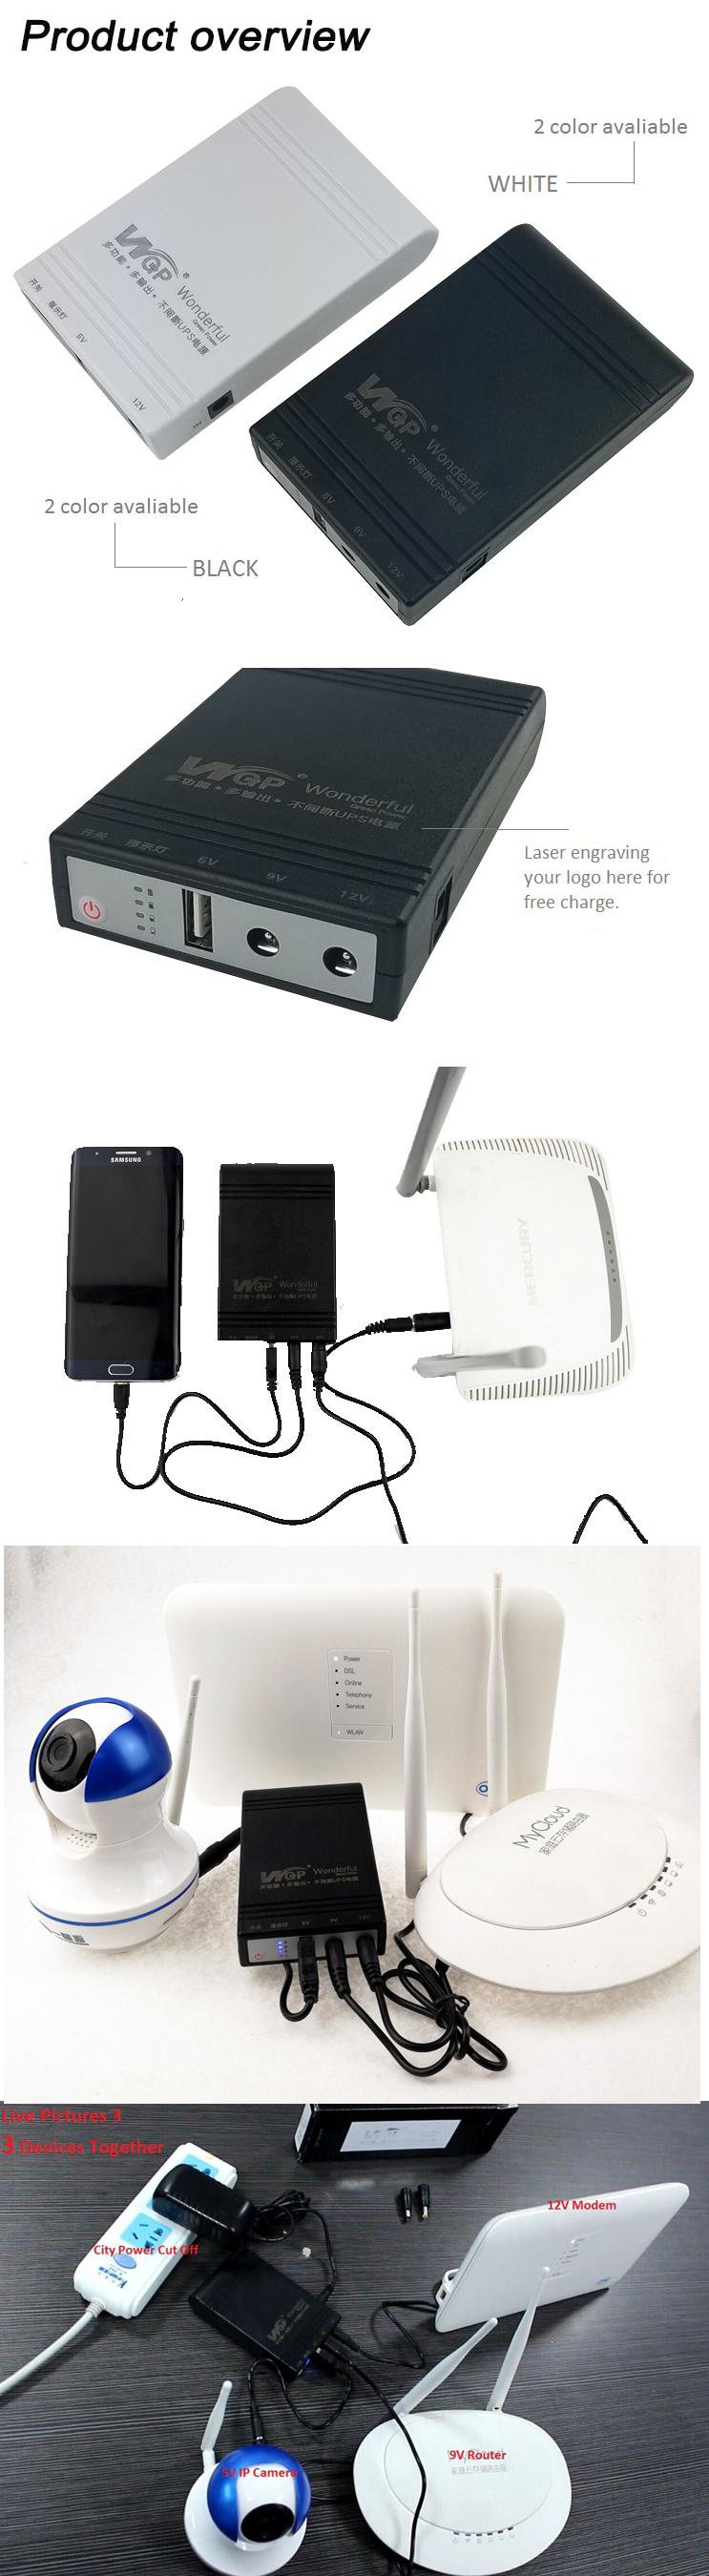 Circuito Ups 12v : Wifi router ip camera ups price lithium battery backup power